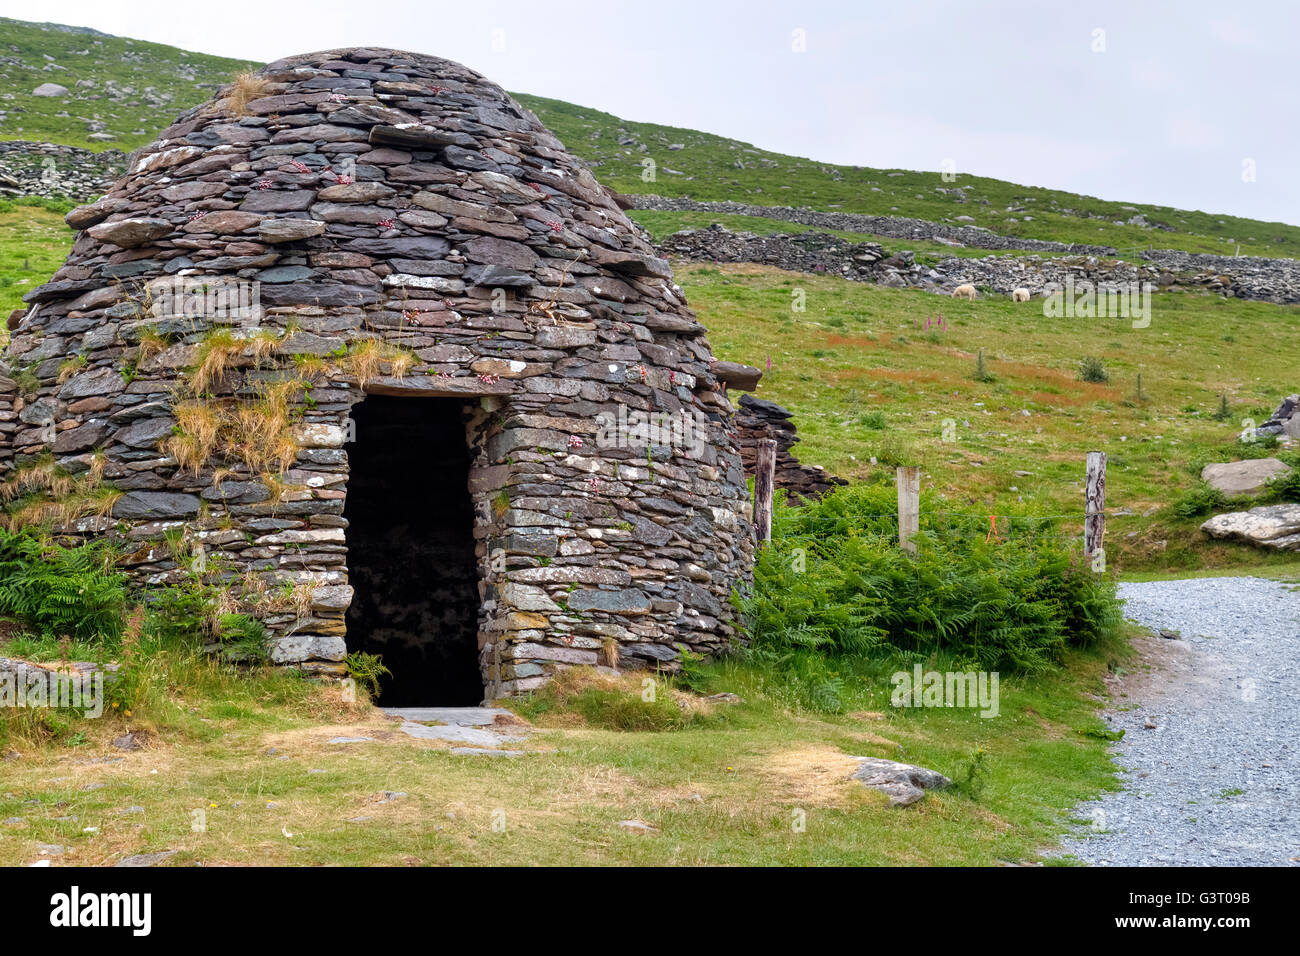 Beehive Huts, Fahan, Dingle Peninsula, Kerry, Ireland - Stock Image